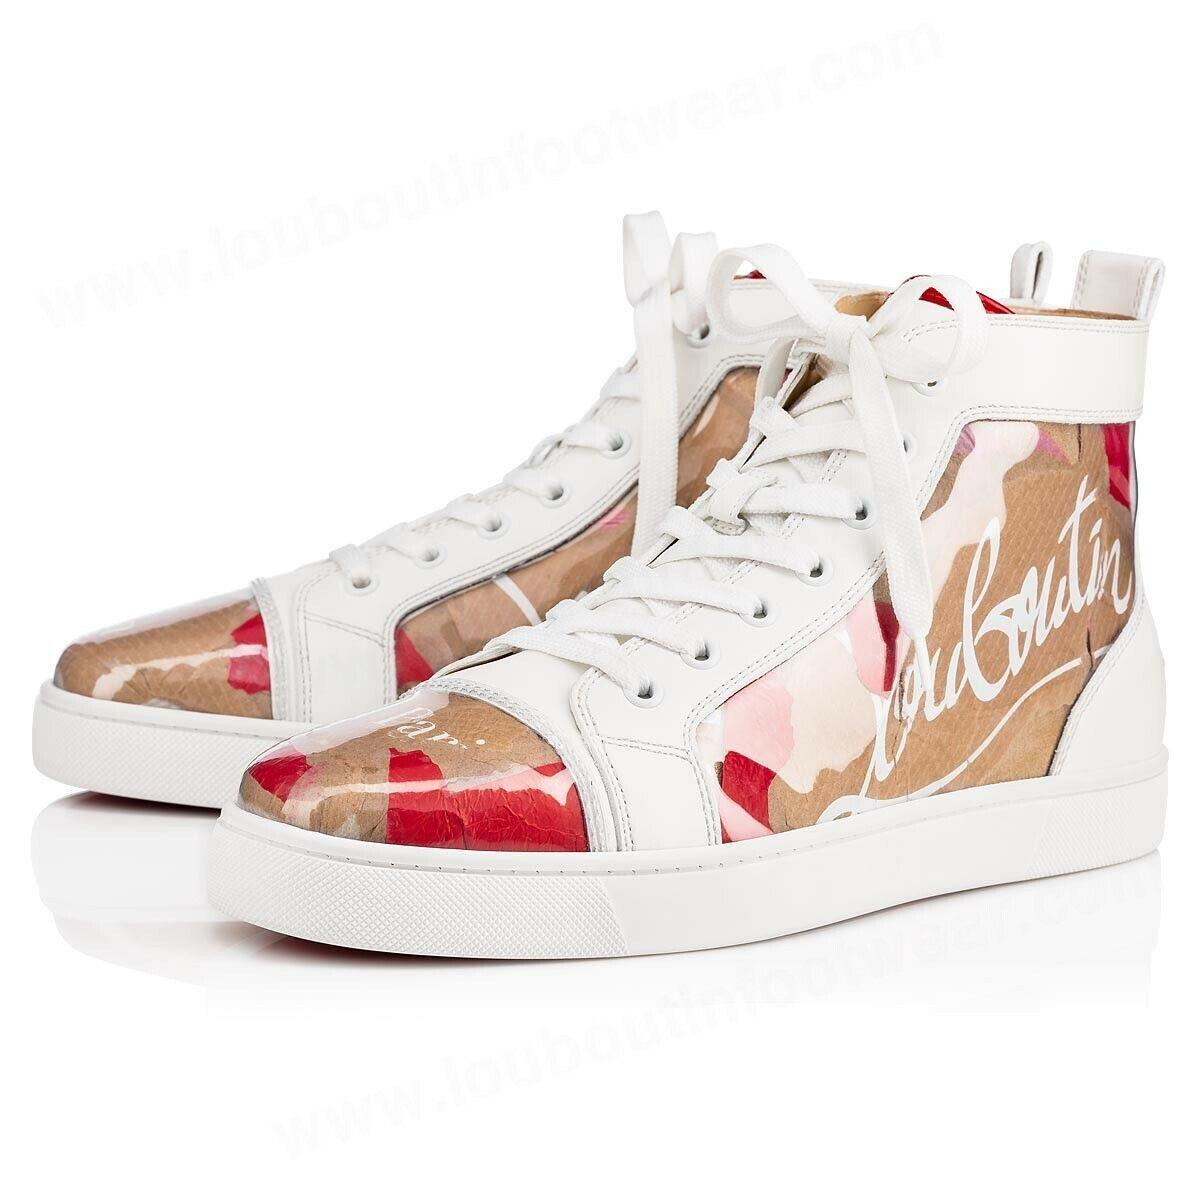 Christian Louboutin Mens Louis Flat Loubi Kraft PVC Nude Red High Top Sneaker 47